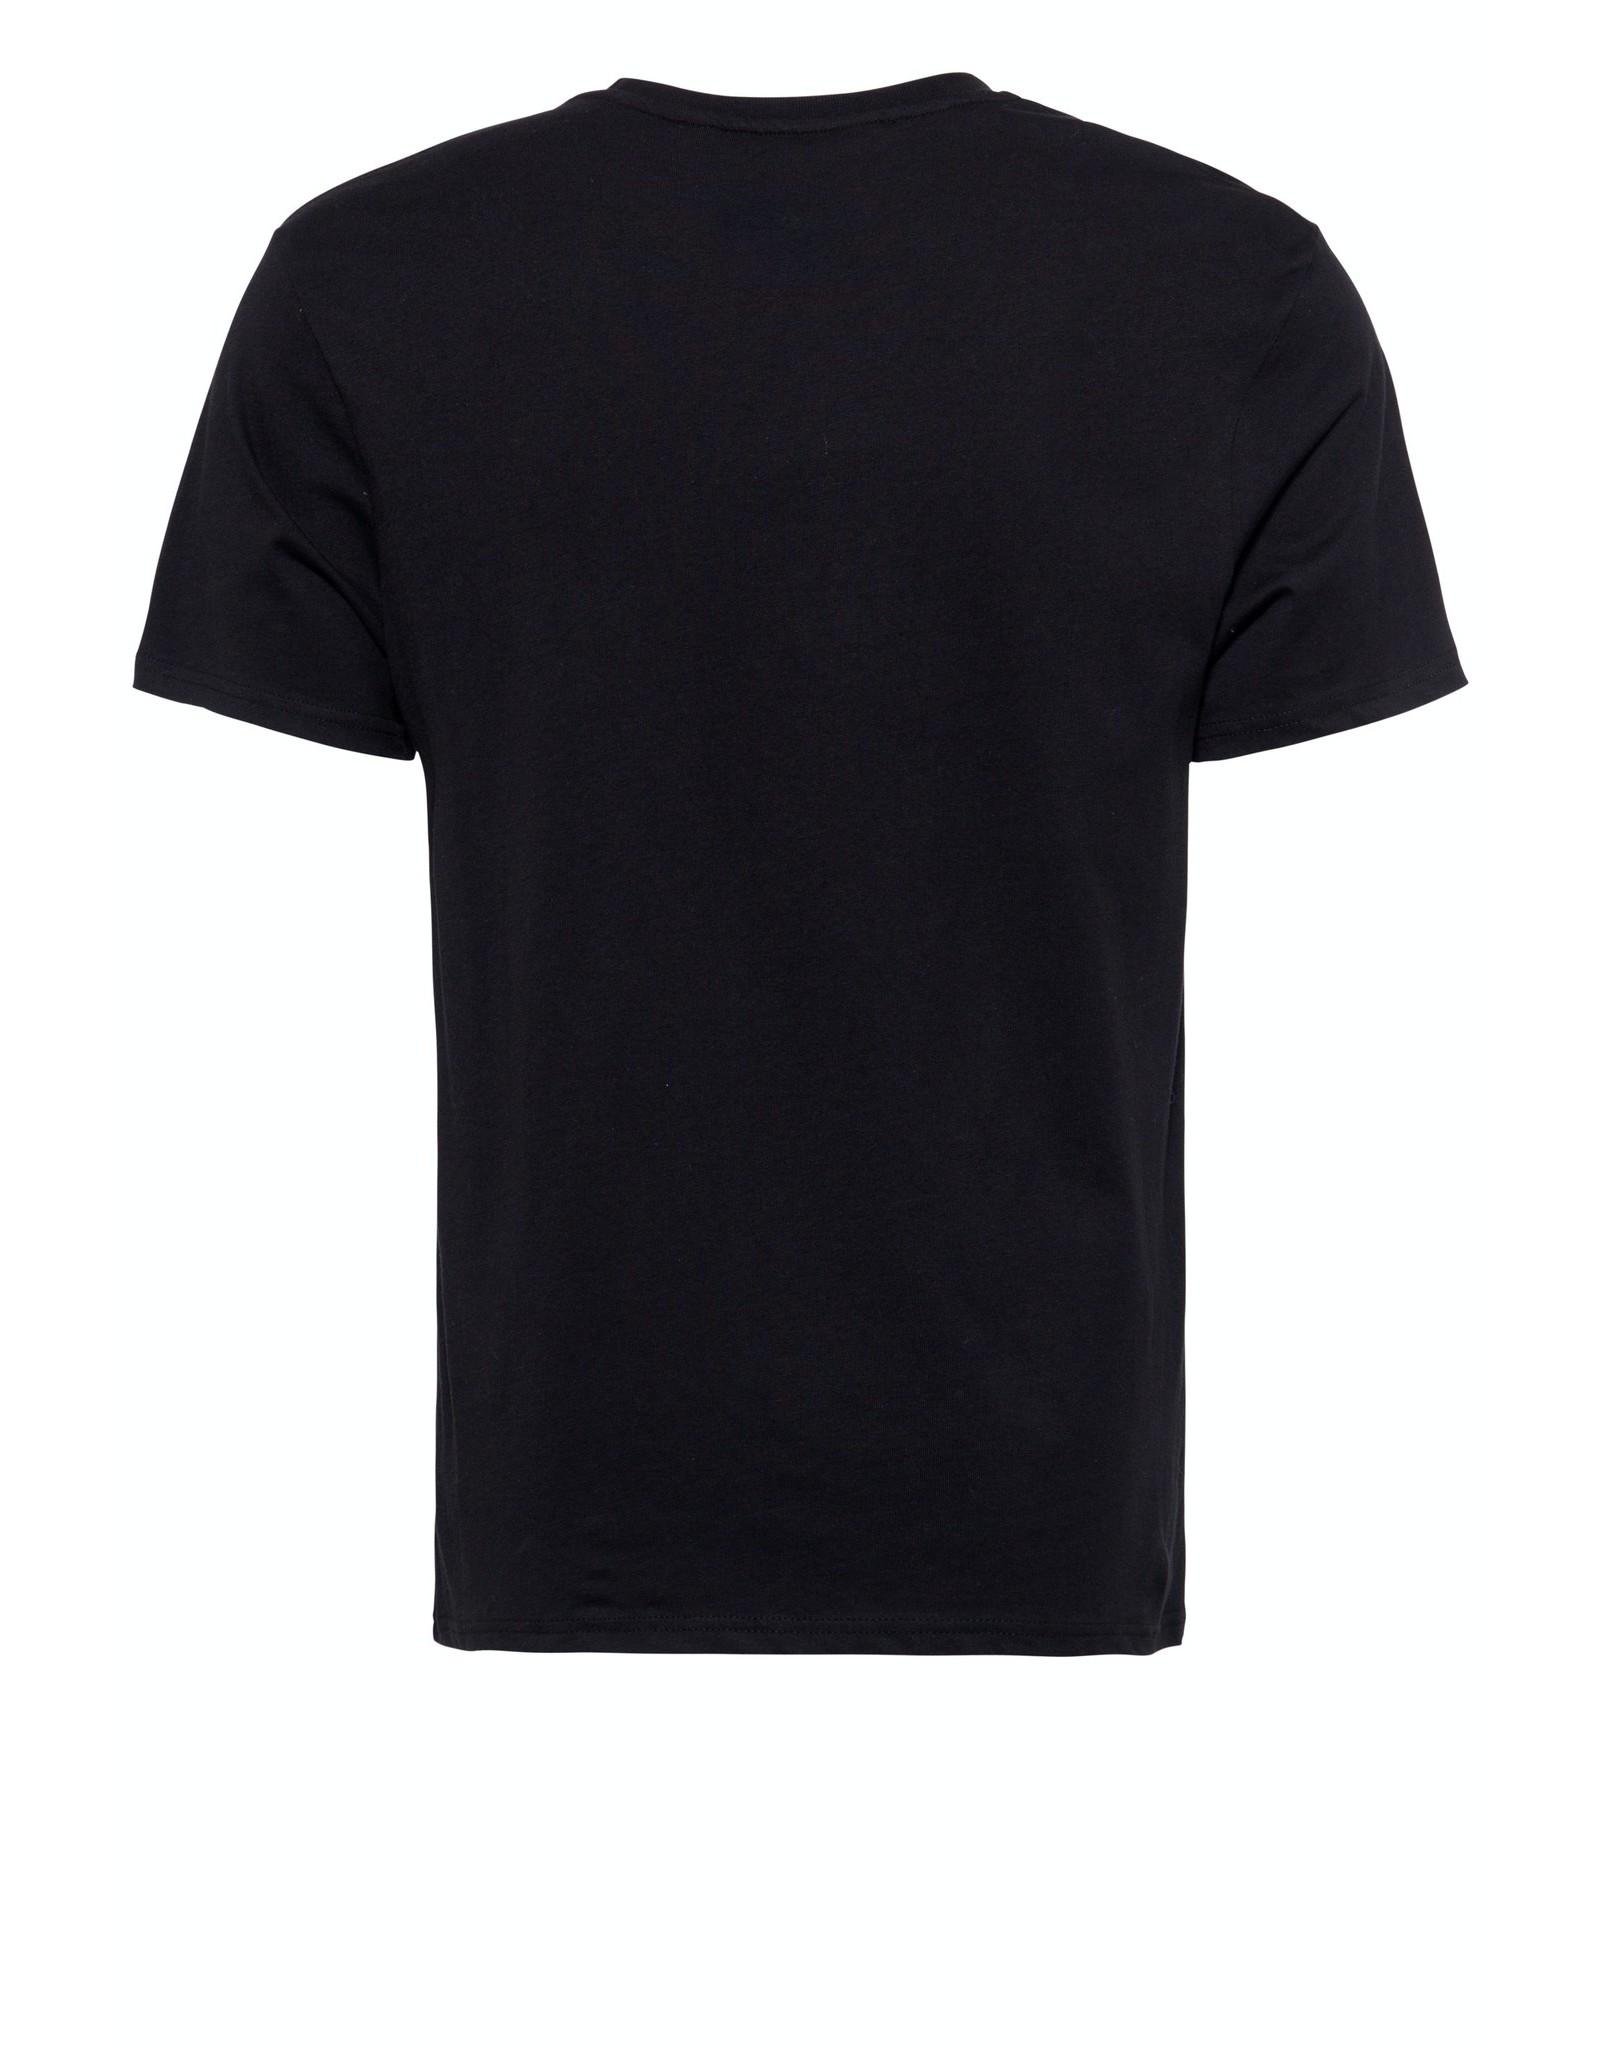 King Kerosin King Kerosin T-Shirt Tijuana Mexico in Black